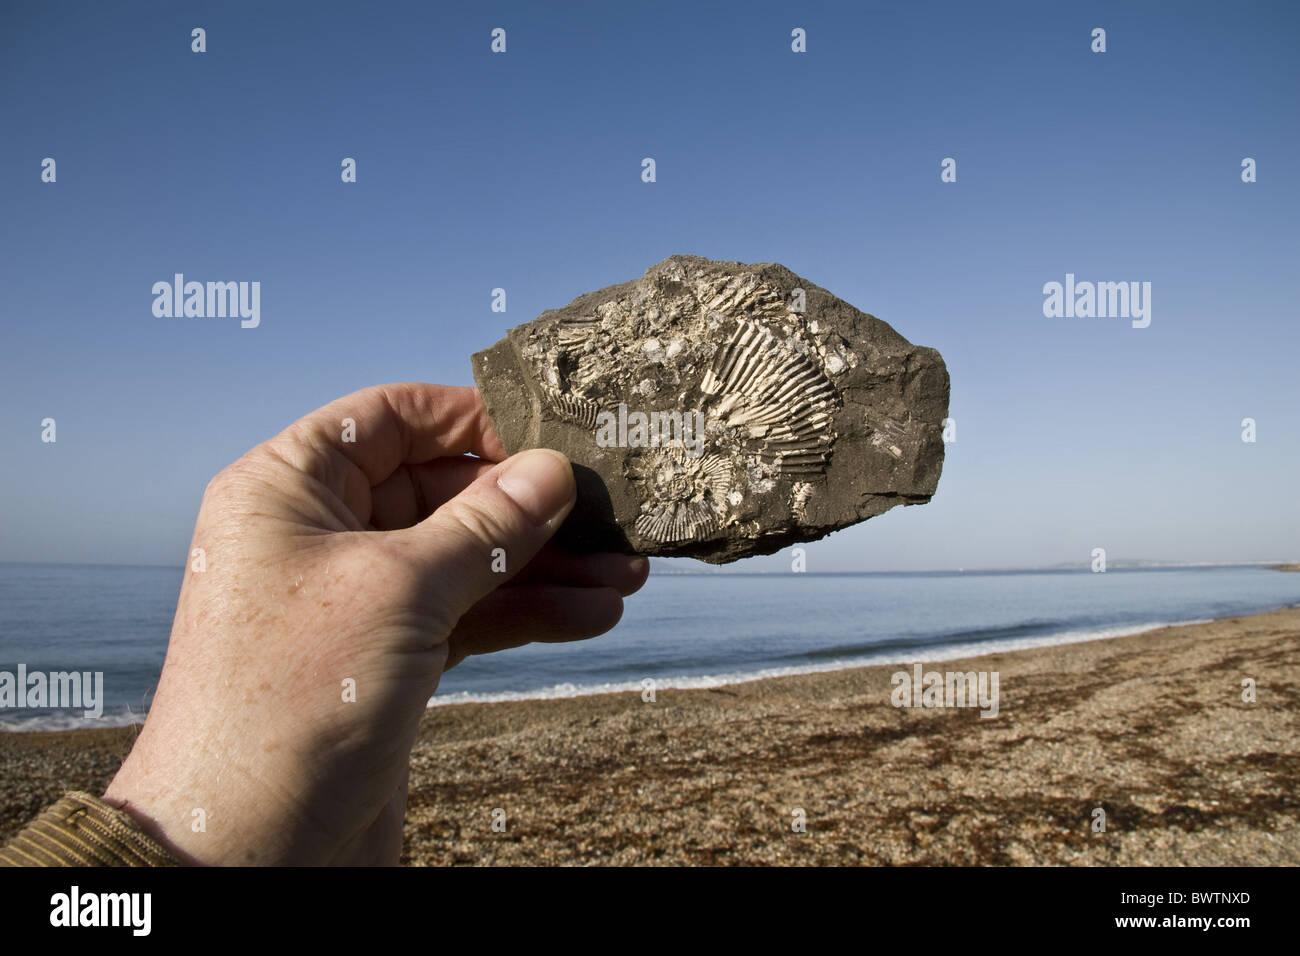 britain british england english europe european fossil fossils fossilised geology geological. geologis world heritage - Stock Image